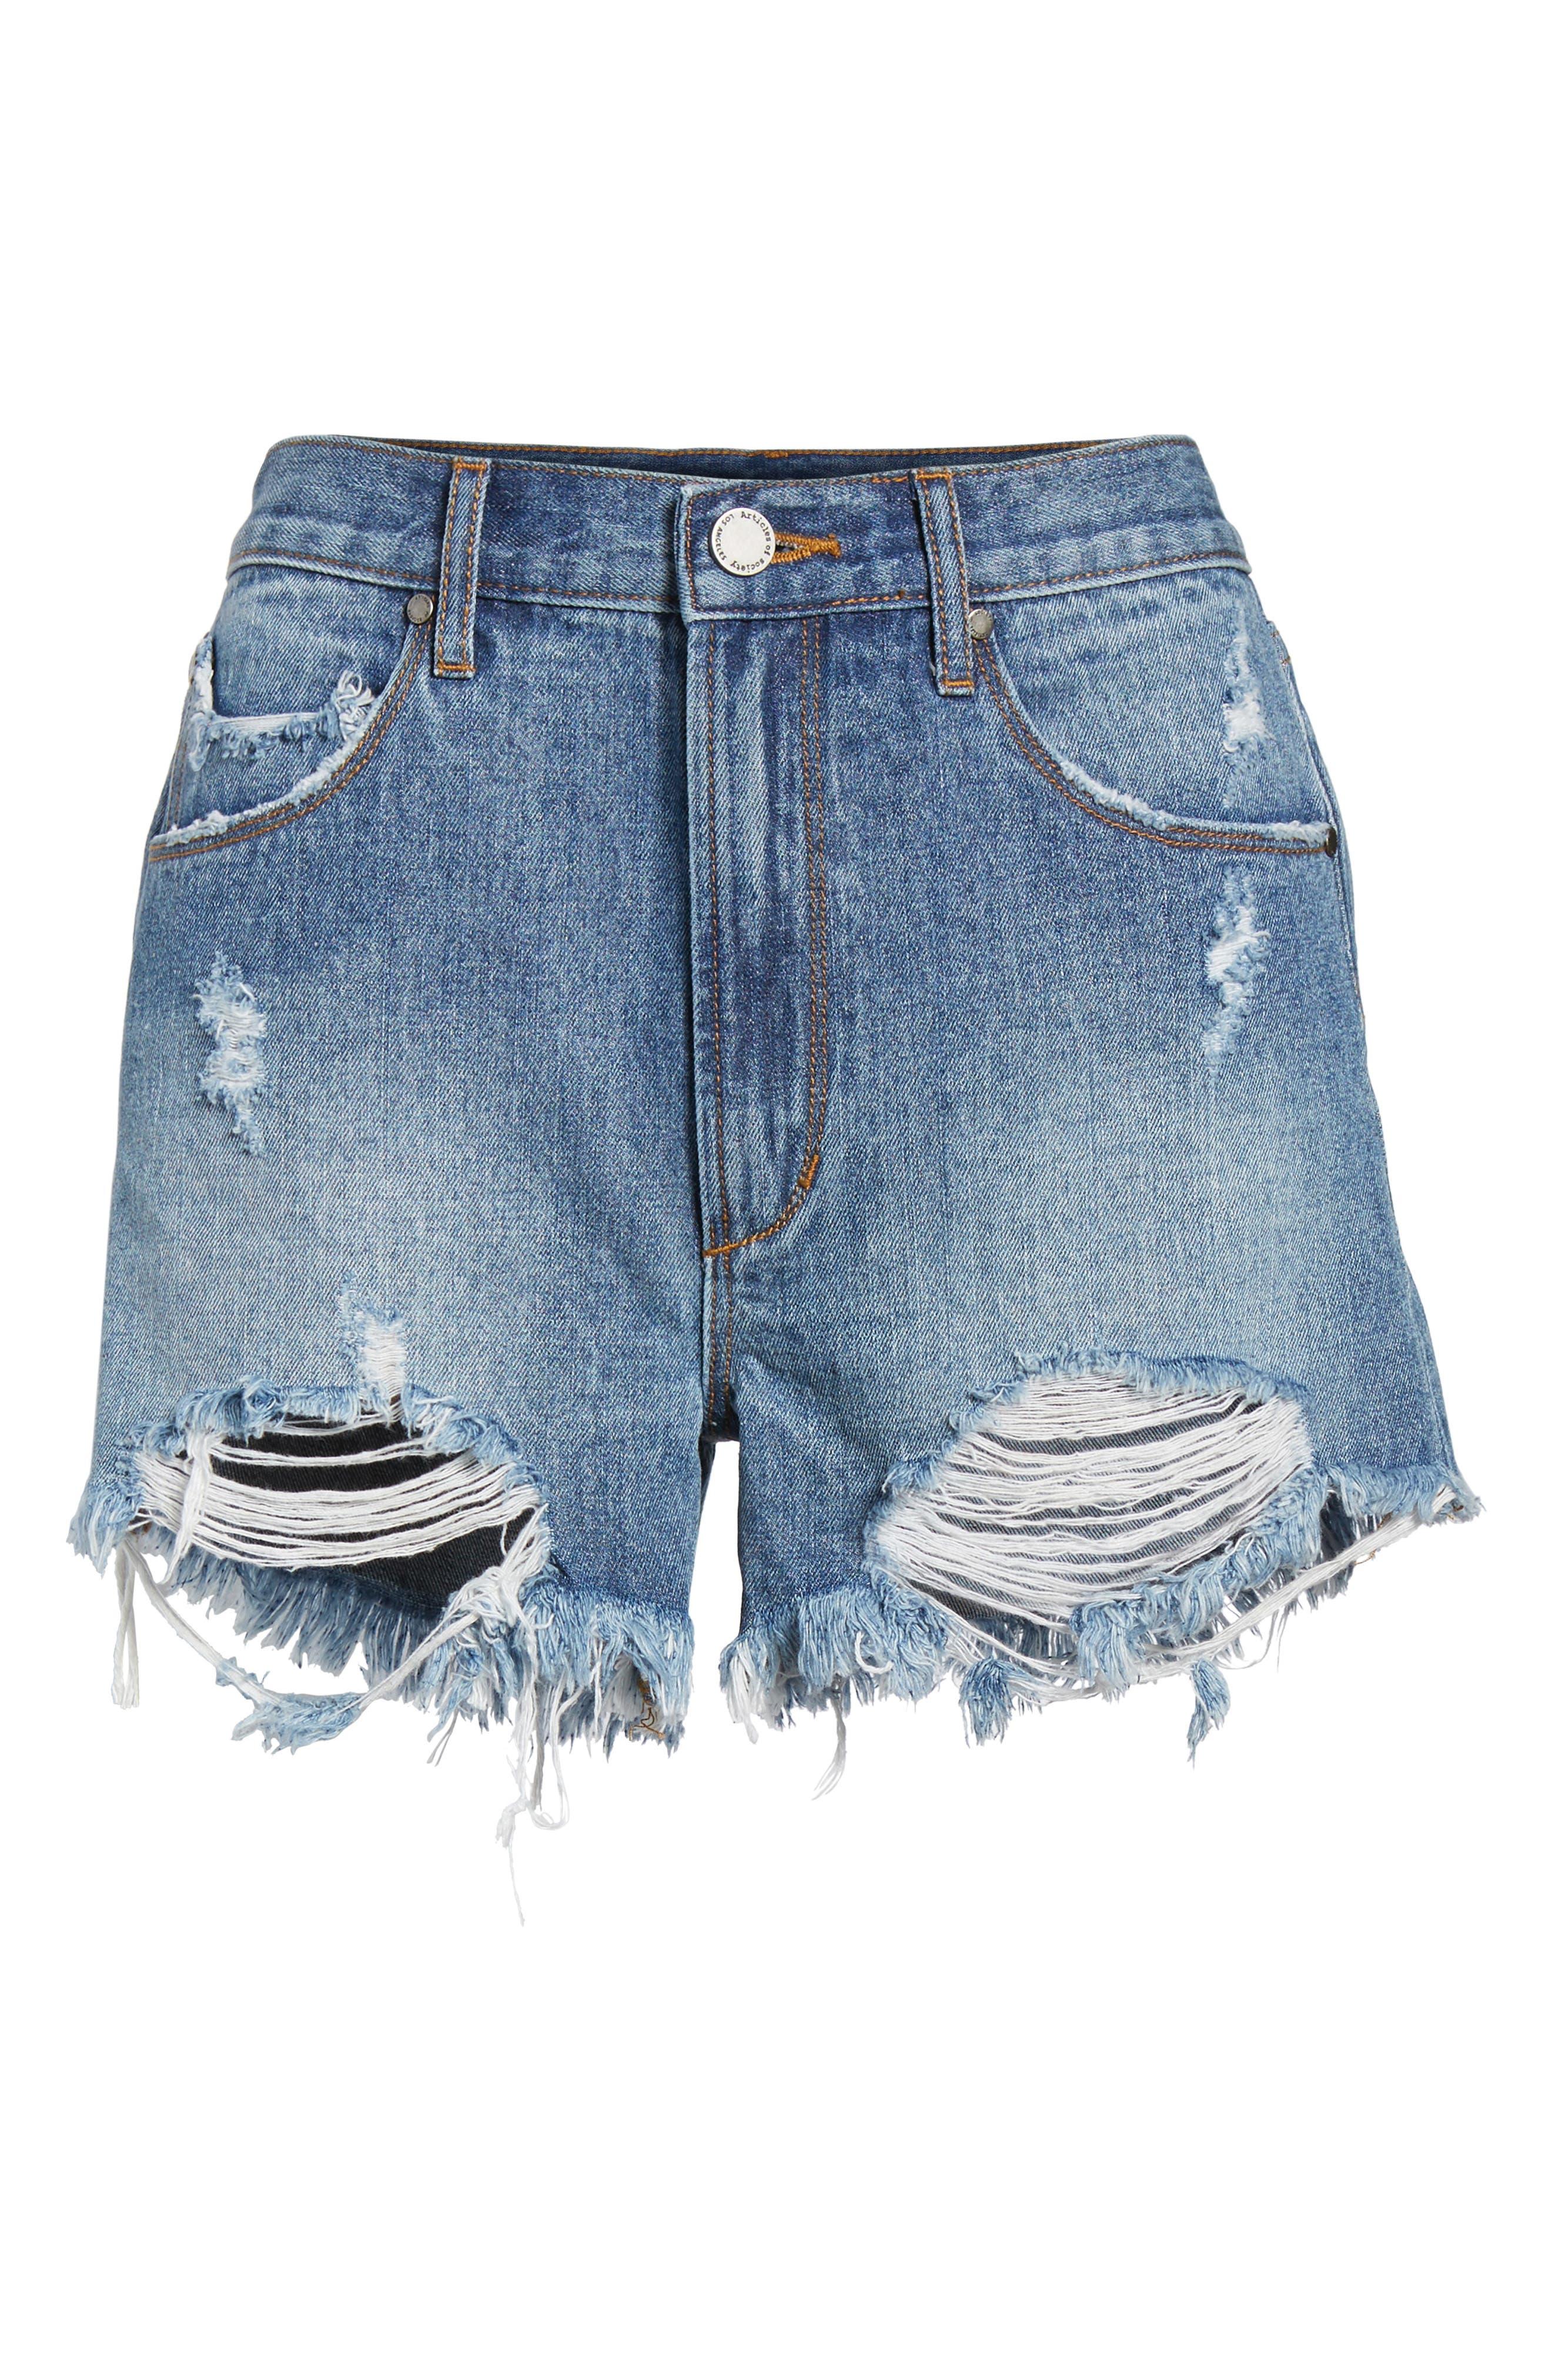 Meredith Destroyed Hem Denim Shorts,                             Alternate thumbnail 7, color,                             VALENCIA